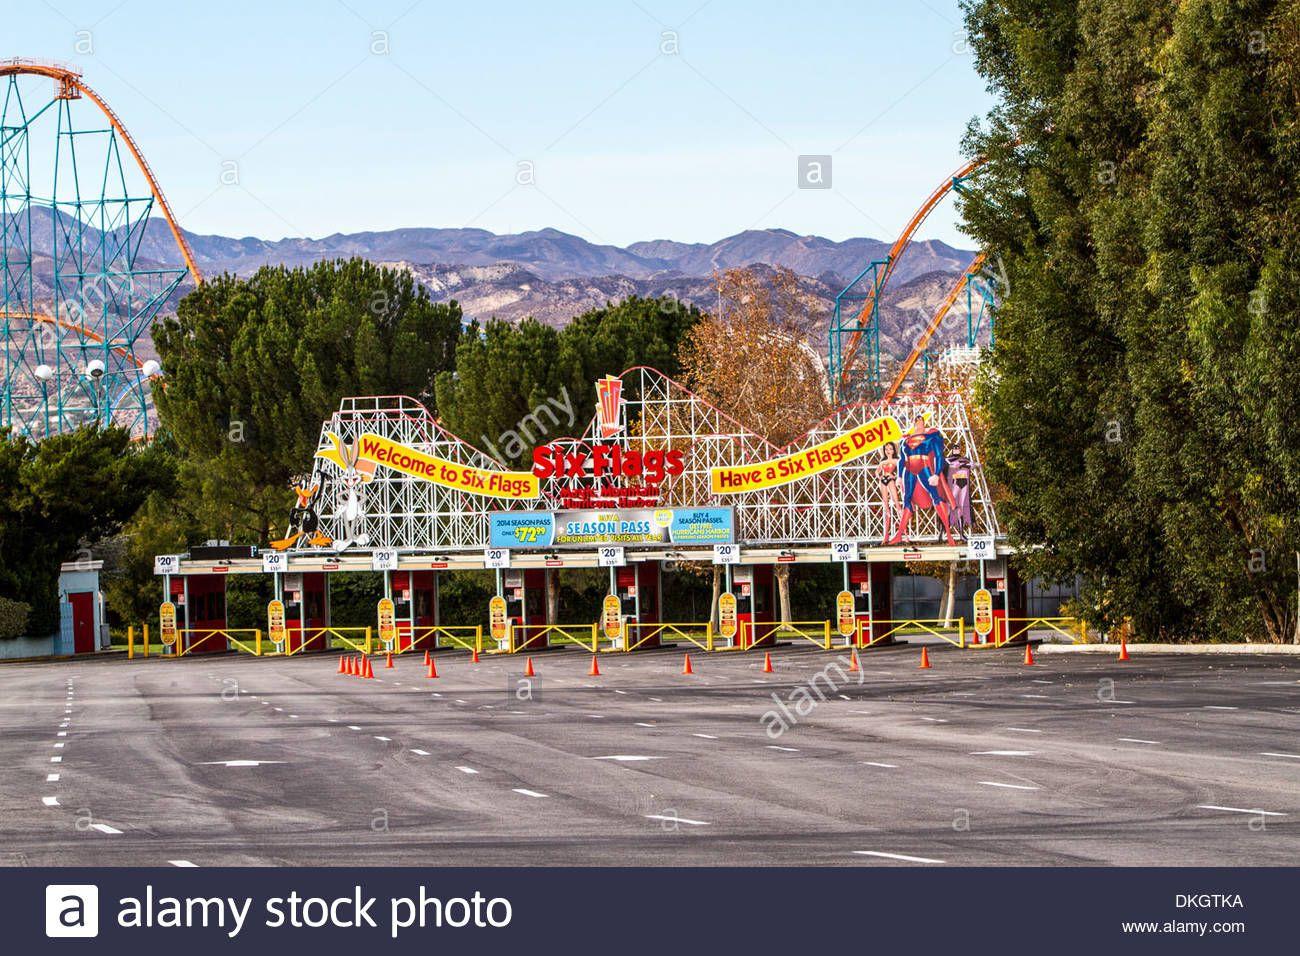 The Entrance To Six Flags Magic Mountain In Valencia California Stock Photo Valencia California Photo Valencia